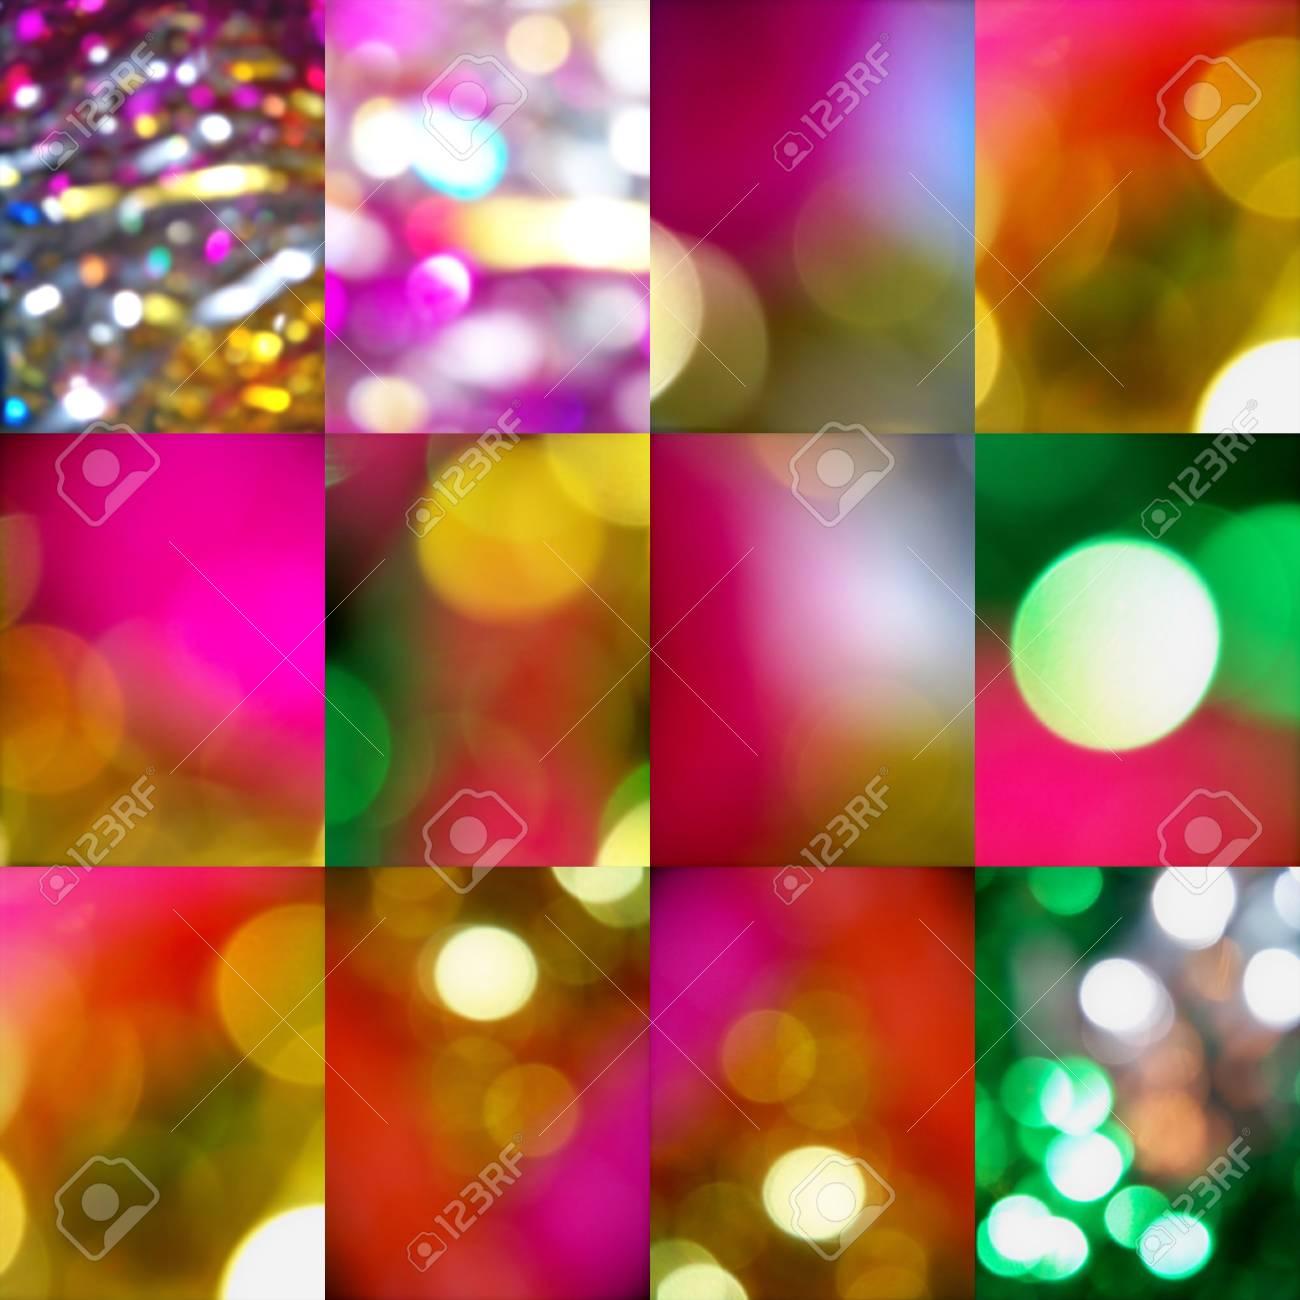 Christmas lights backgrounds Stock Photo - 7371094